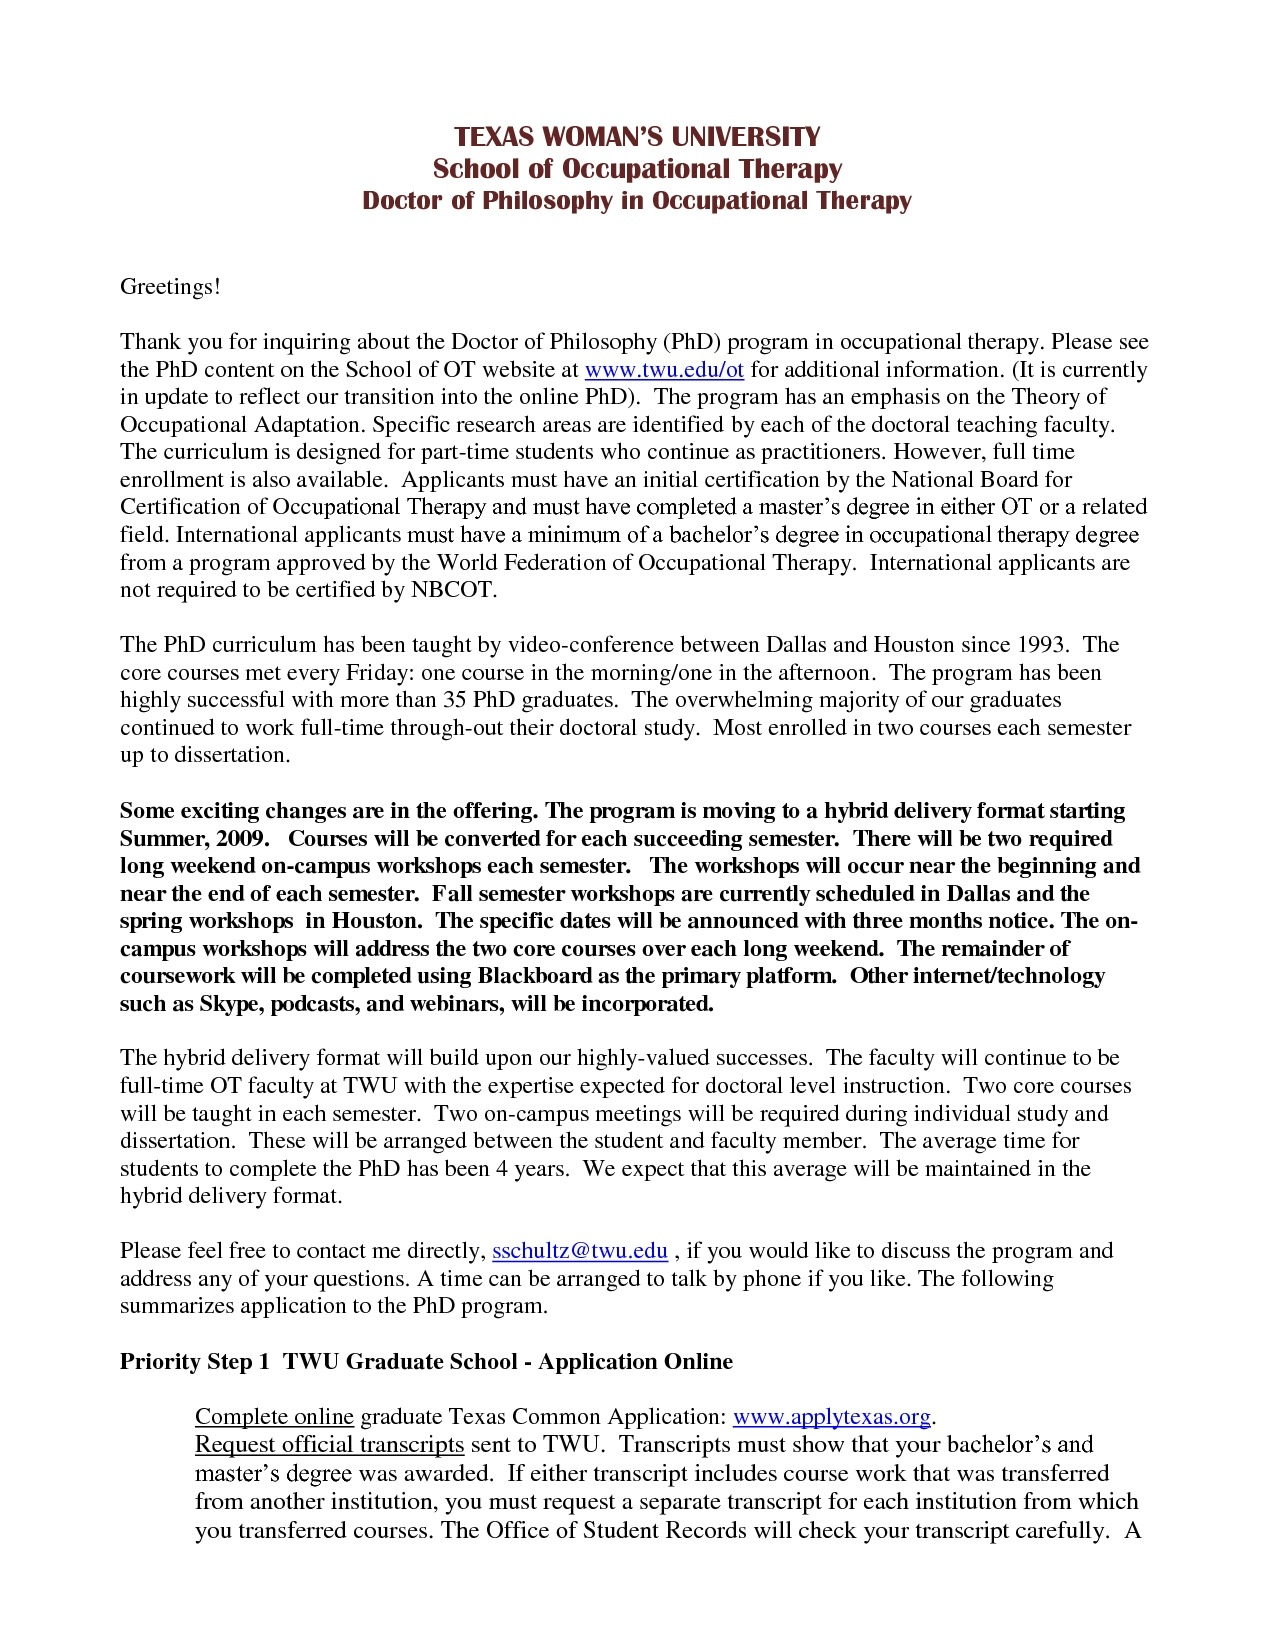 013 Apply Texas Essay Questions Poemsrom Co Common Ap Joli Vibramusic For College Prompts Exa Topics Unusual Examples Topic A 2016 C Full